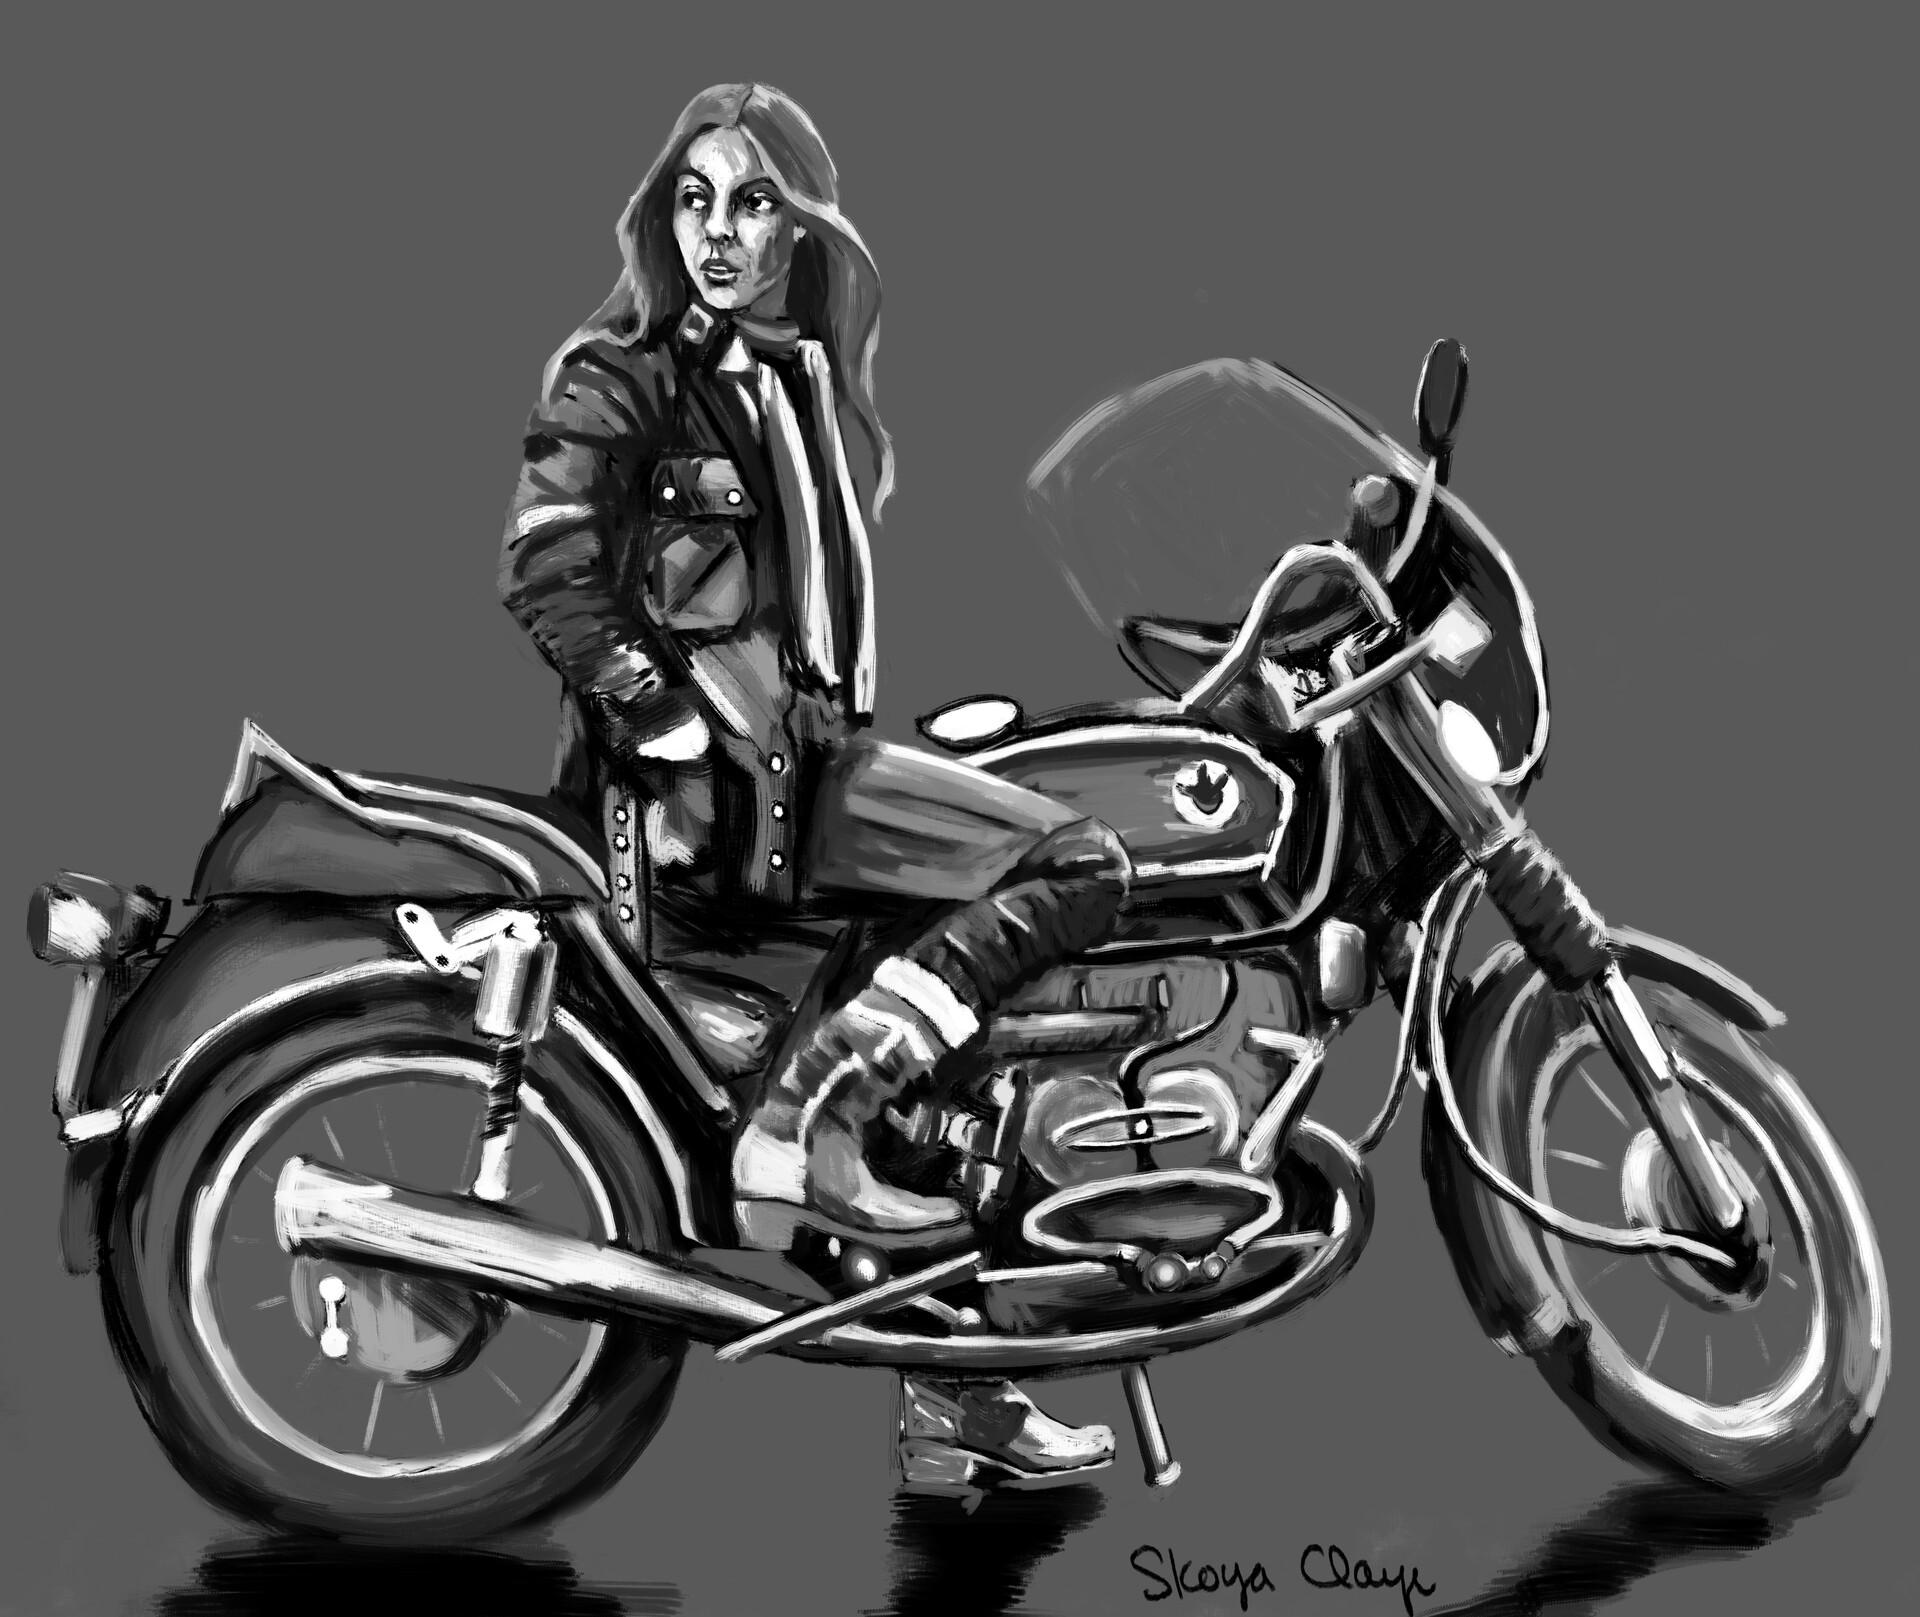 Skoya clayr motorcyclebabe2